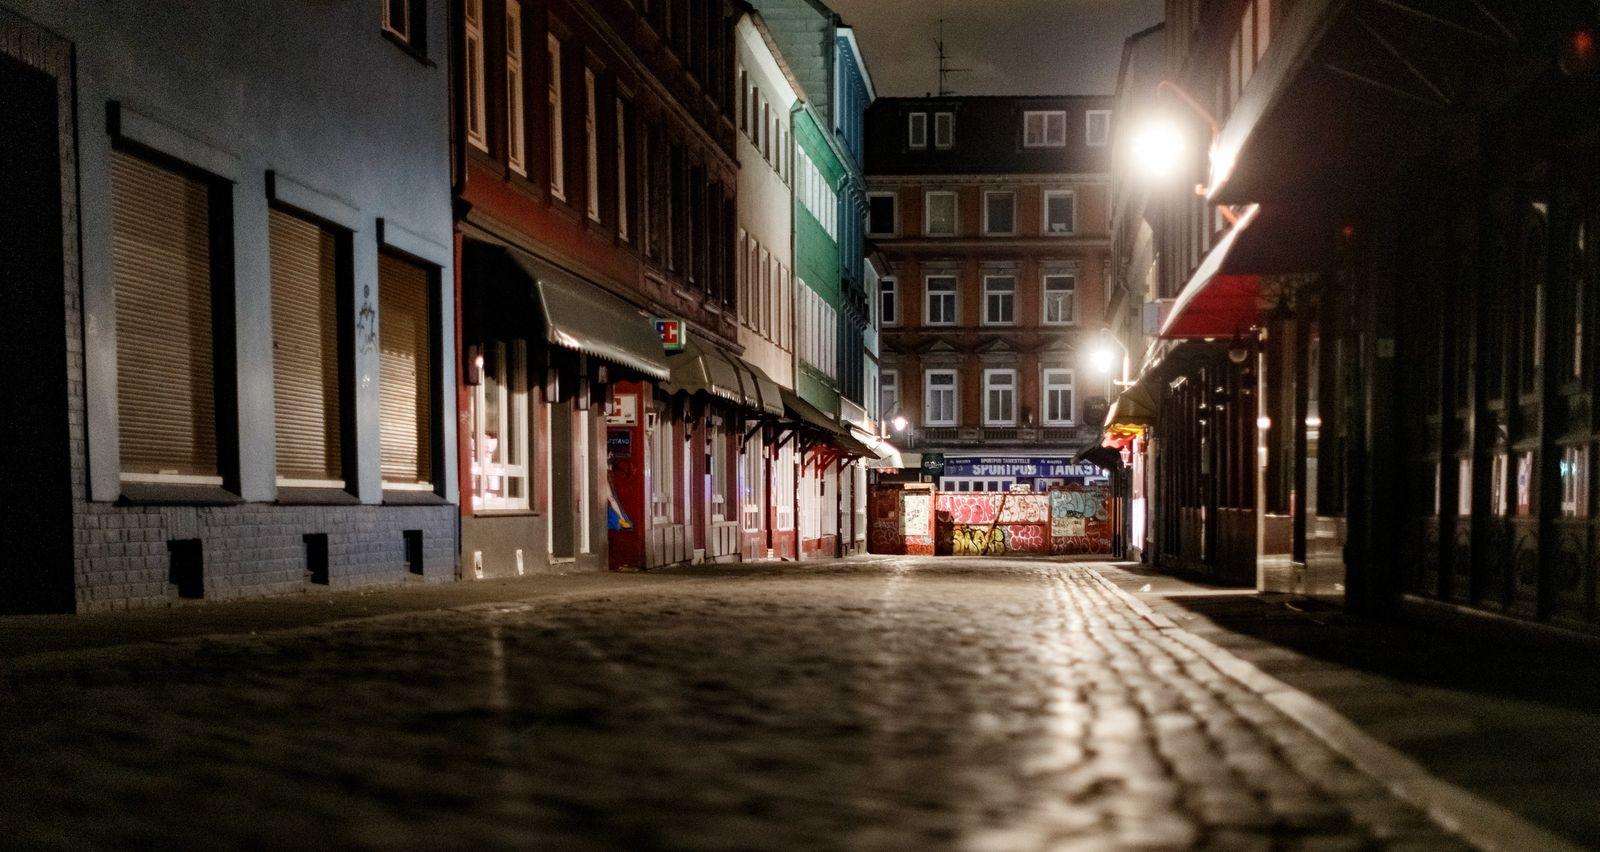 Coronavirus - Ausgangsbeschränkung in Hamburg